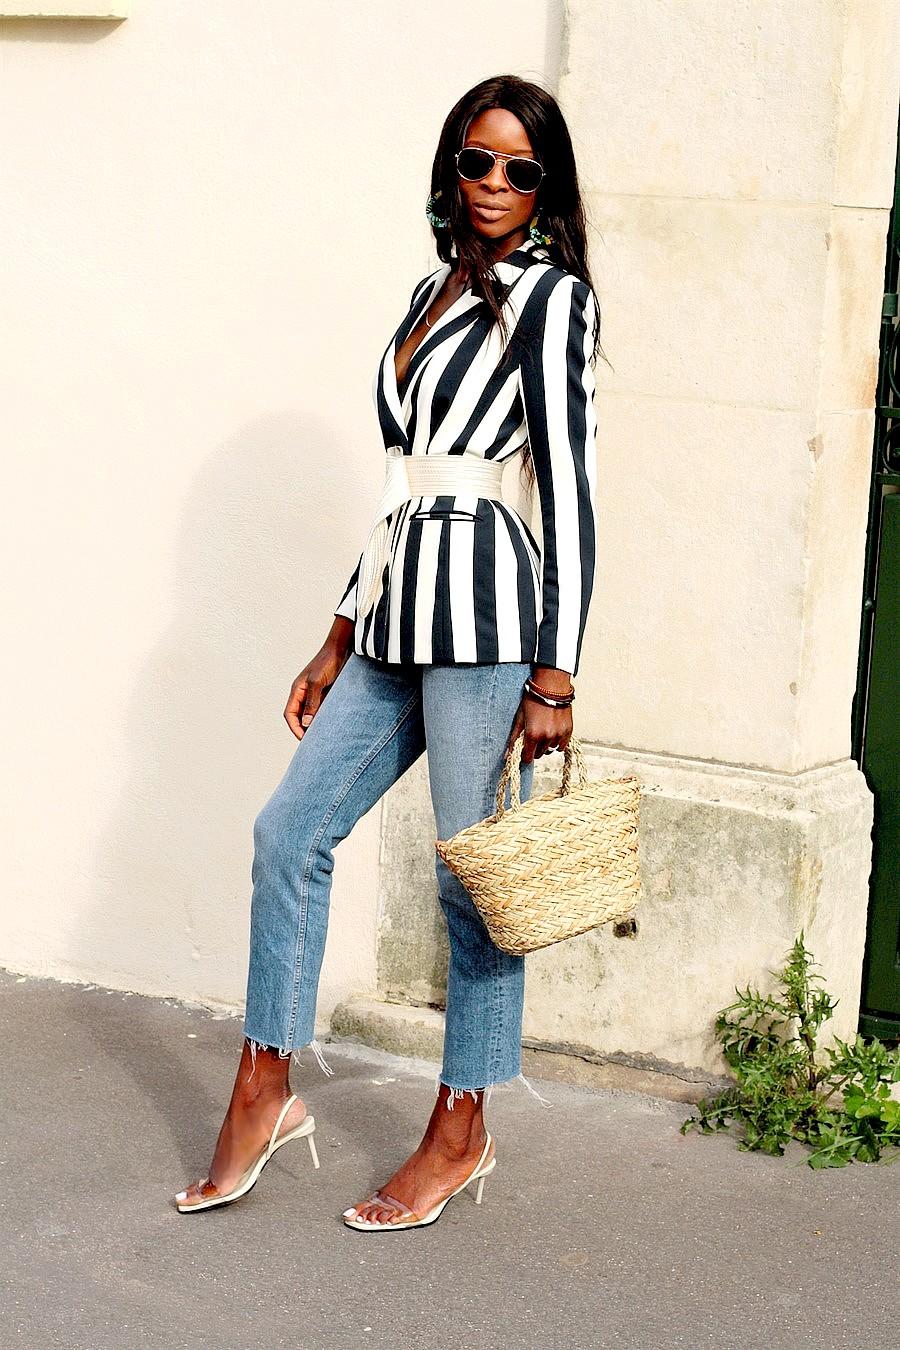 idee-look-chic-en-jeans-summer-style